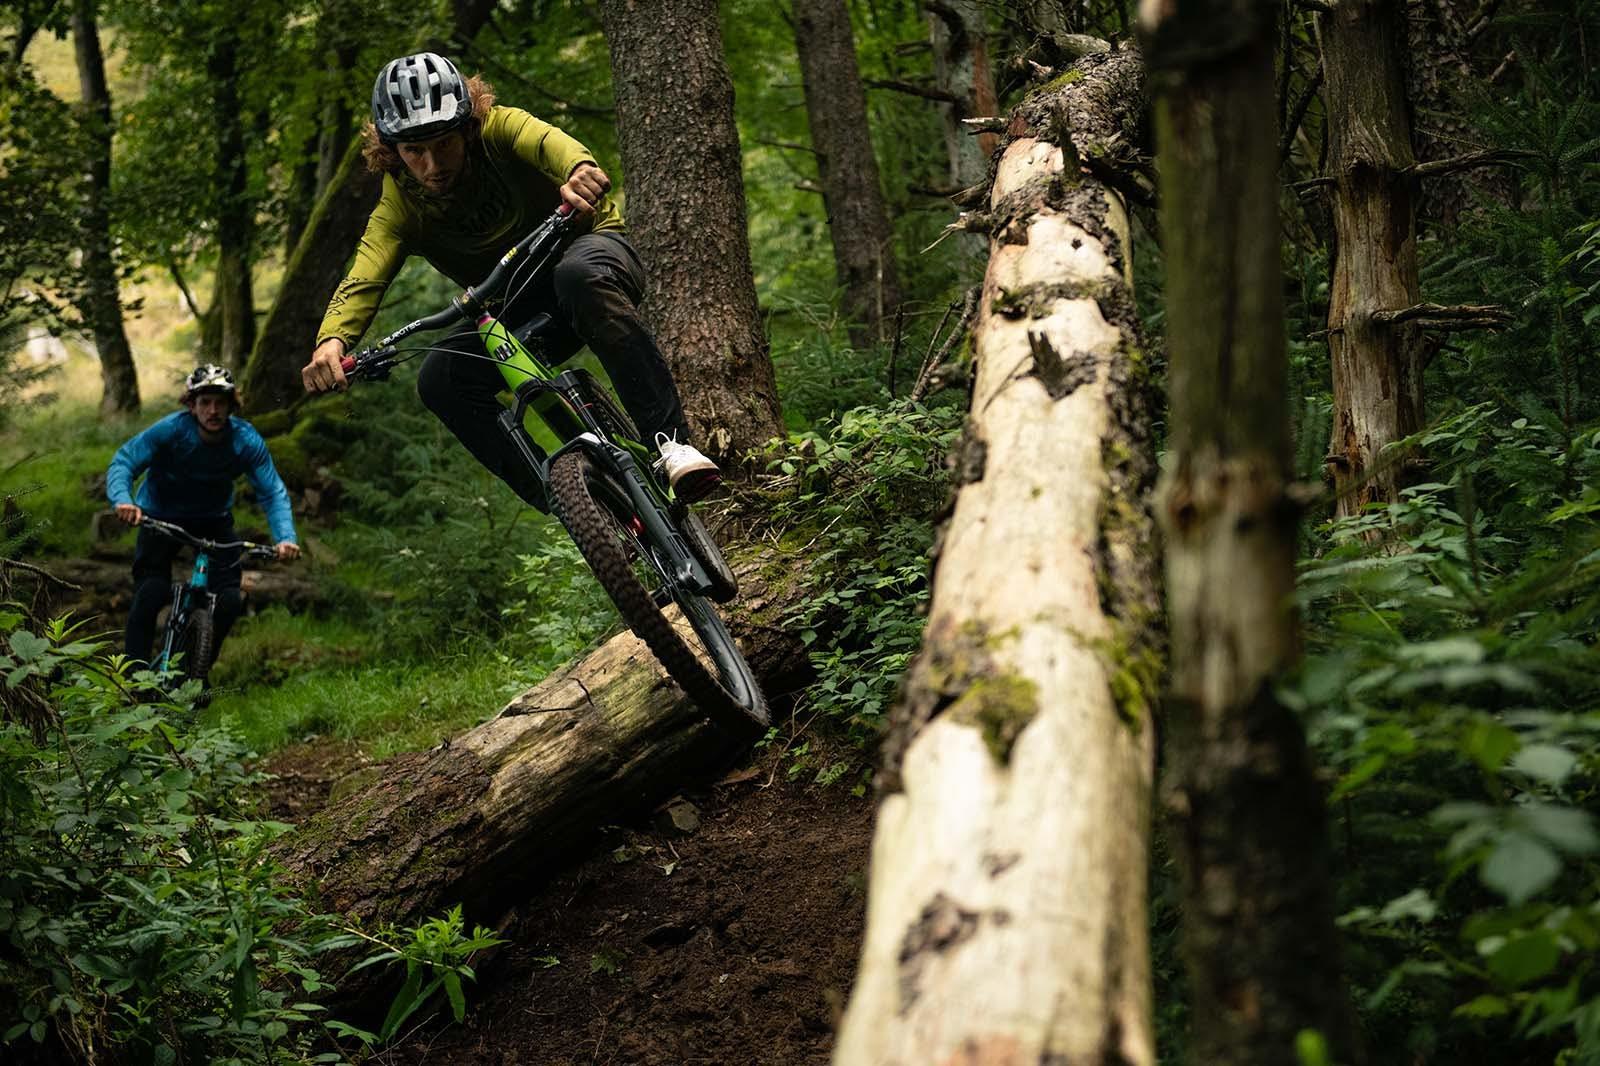 Sam Dale riding his Nomad mountain bike